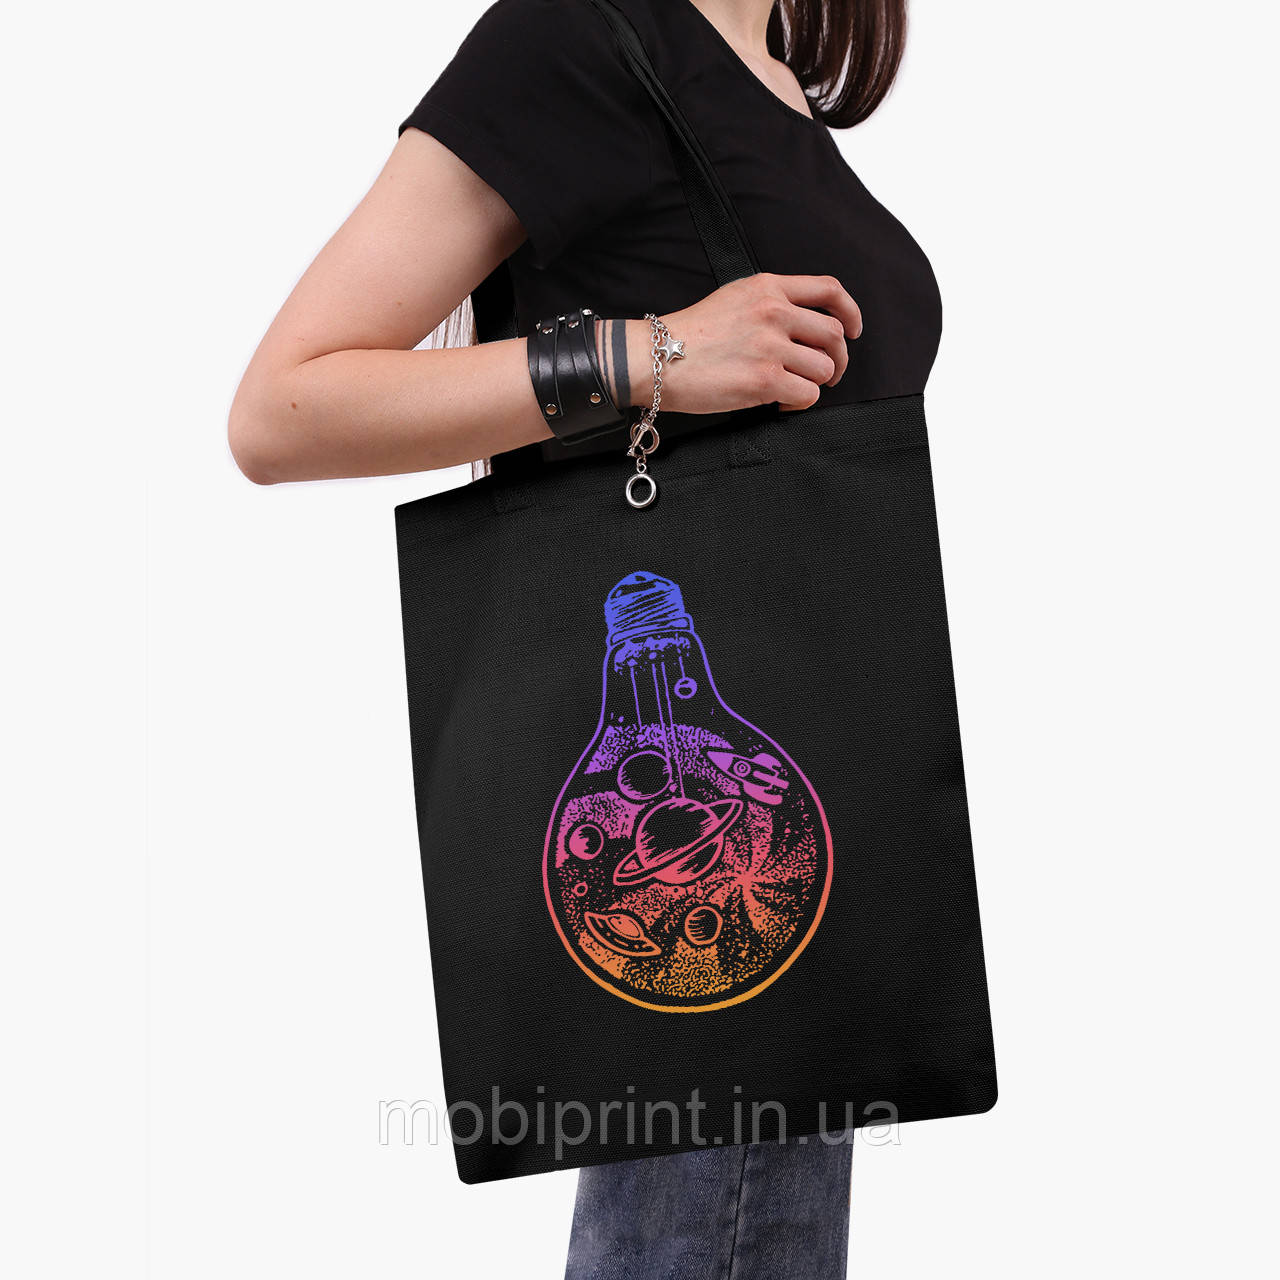 Эко сумка шоппер черная Планеты в лампочке (Planets in a light bulb) (9227-2839-2)  41*35 см